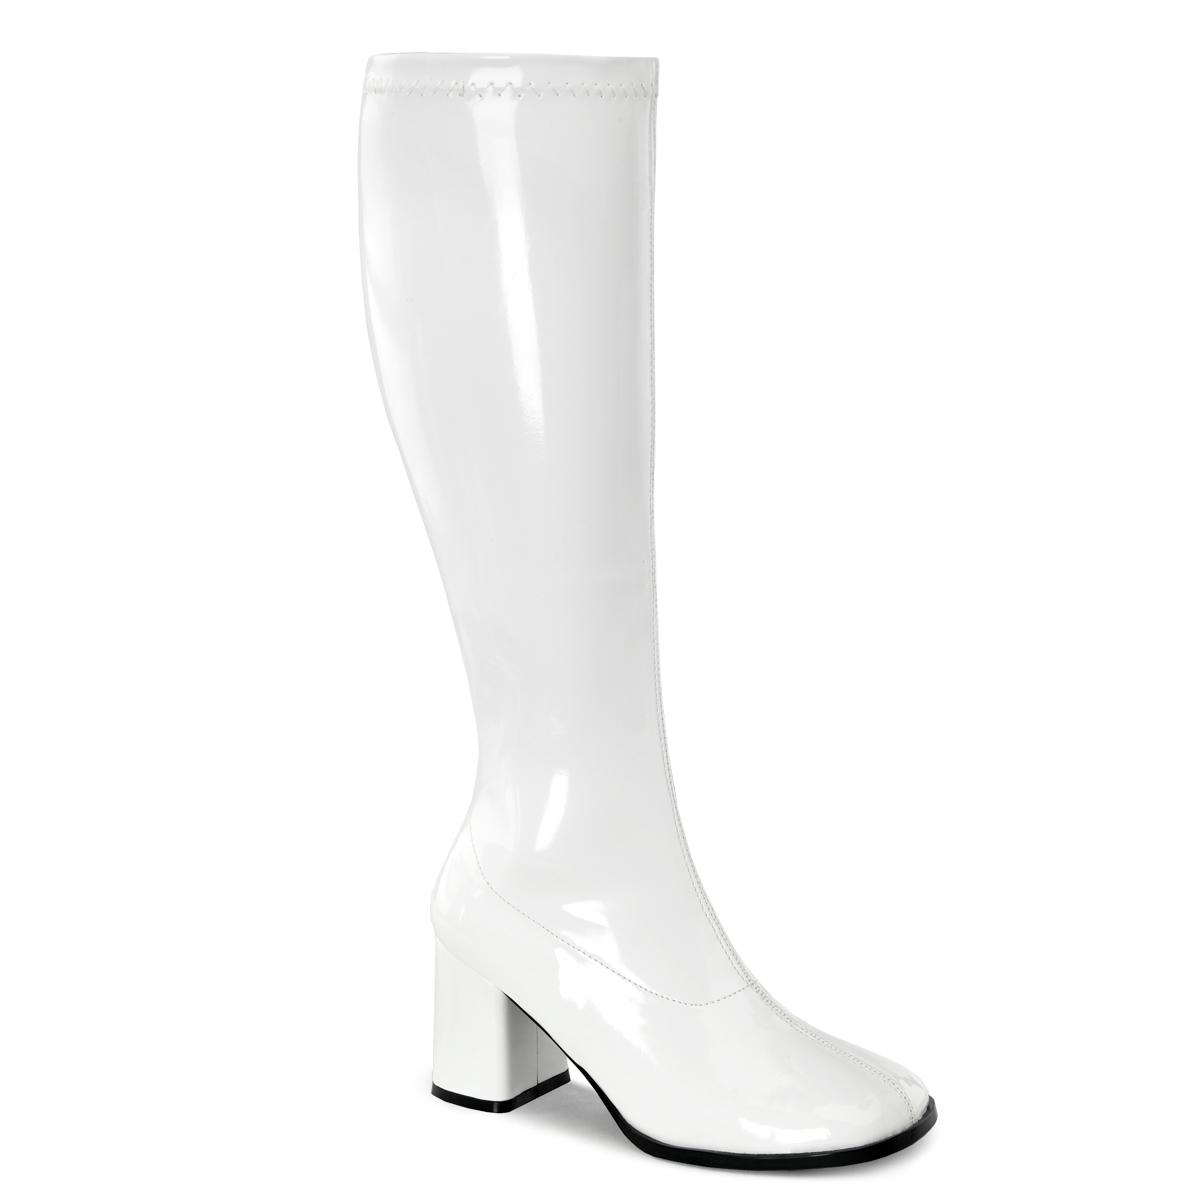 Funtasma Retro Stiefel RETRO-300 - Lack Weiß 46 EU 4stT1